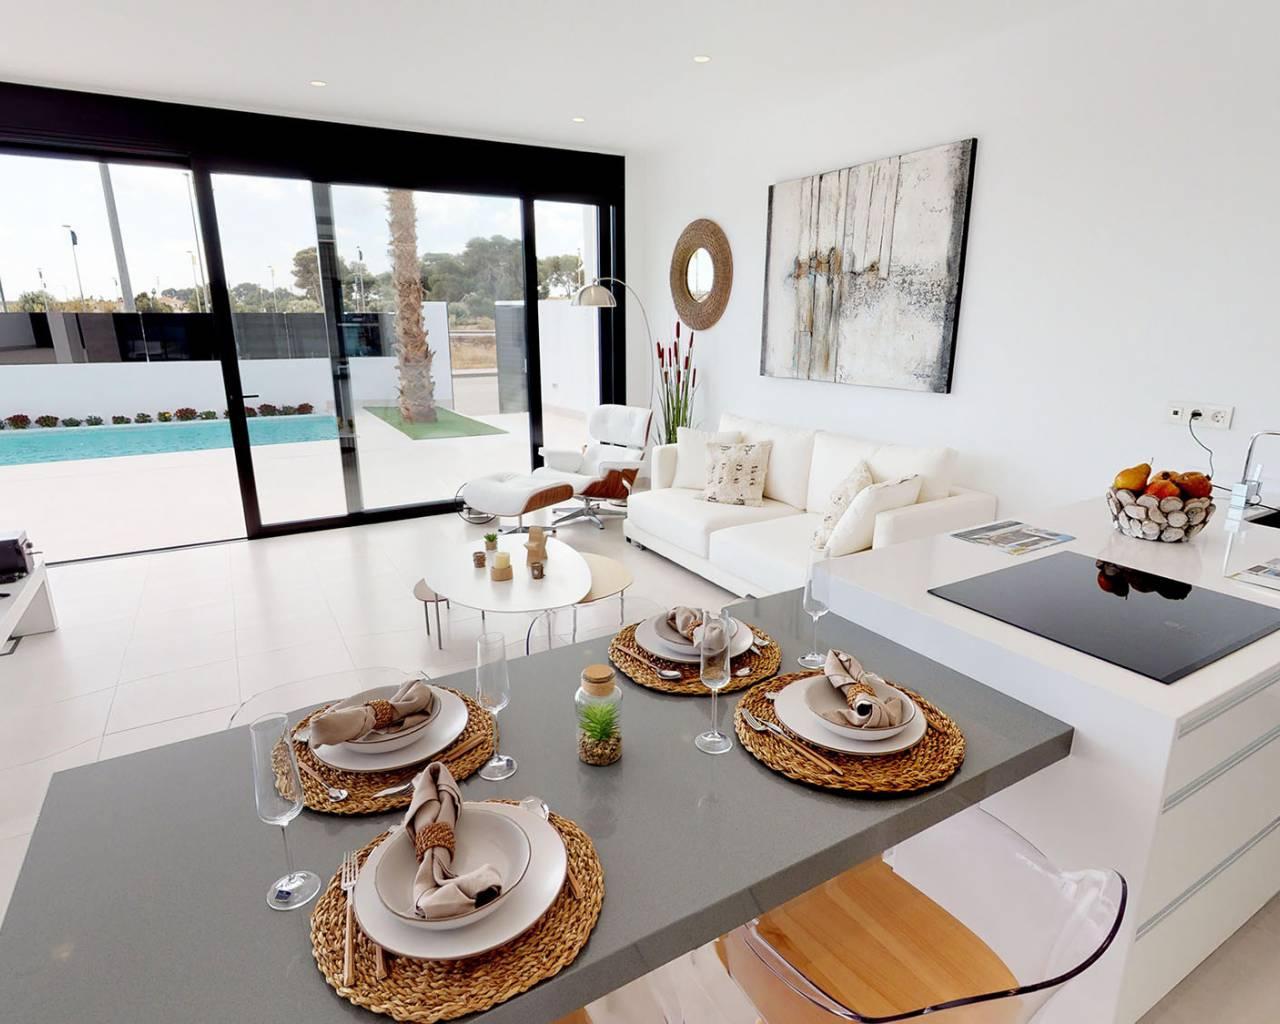 nieuwbouw-vrijstaande-villa-sucina-centro_2720_xl